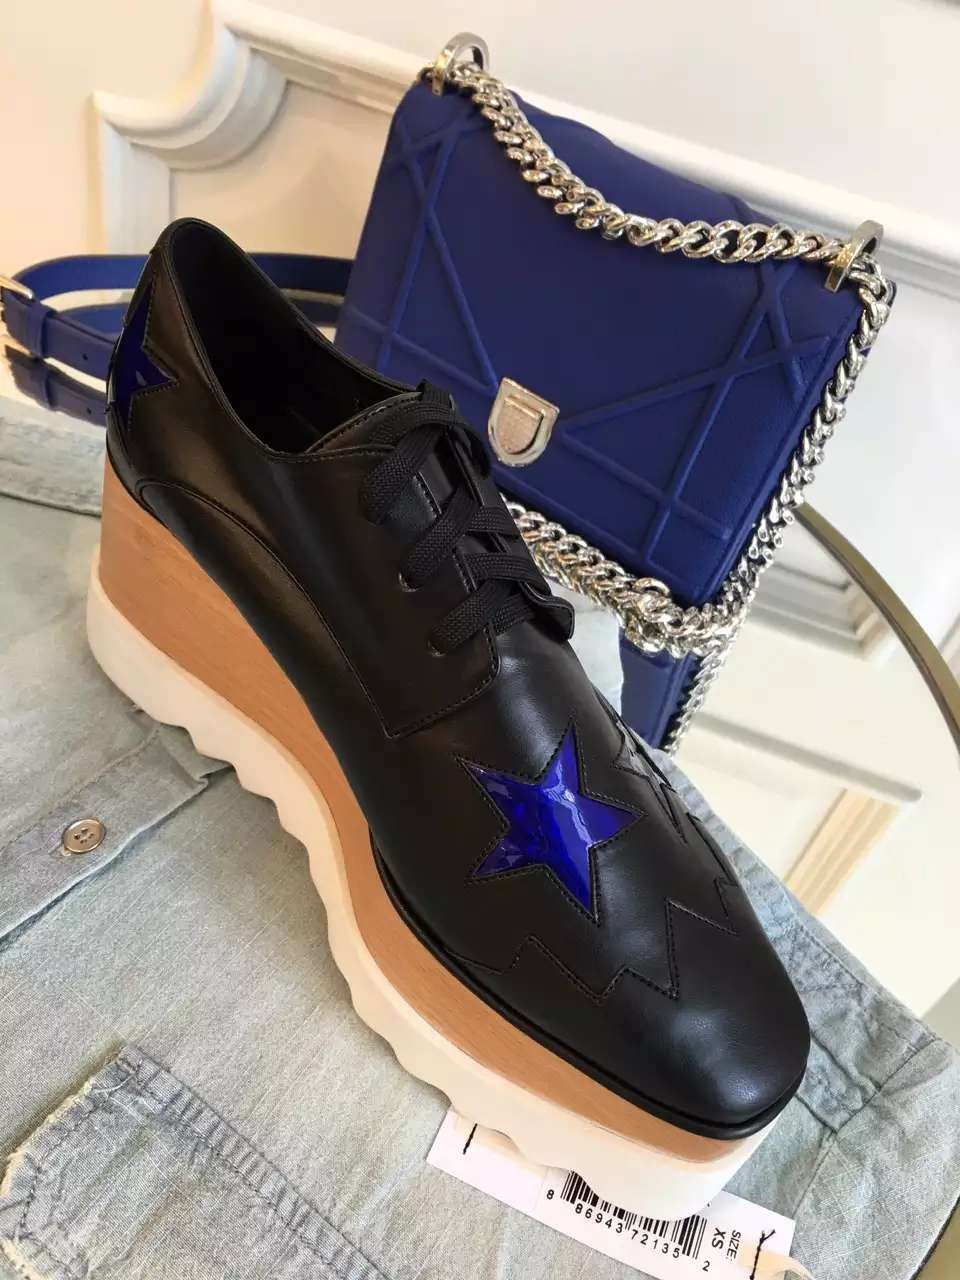 stella mccartney Shoes, ID : 50644(FORSALE:a@yybags.com), black leather handbags, lightweight backpack, designer purses, rolling backpacks, brand name purses, backpack wheels, man s wallet, backpack shop, handmade purses, laptop backpack, cool handbags, funky handbags, small backpack, silver handbags, best briefcases, purse shop #stellamccartneyShoes #stellamccartney #unique #backpacks